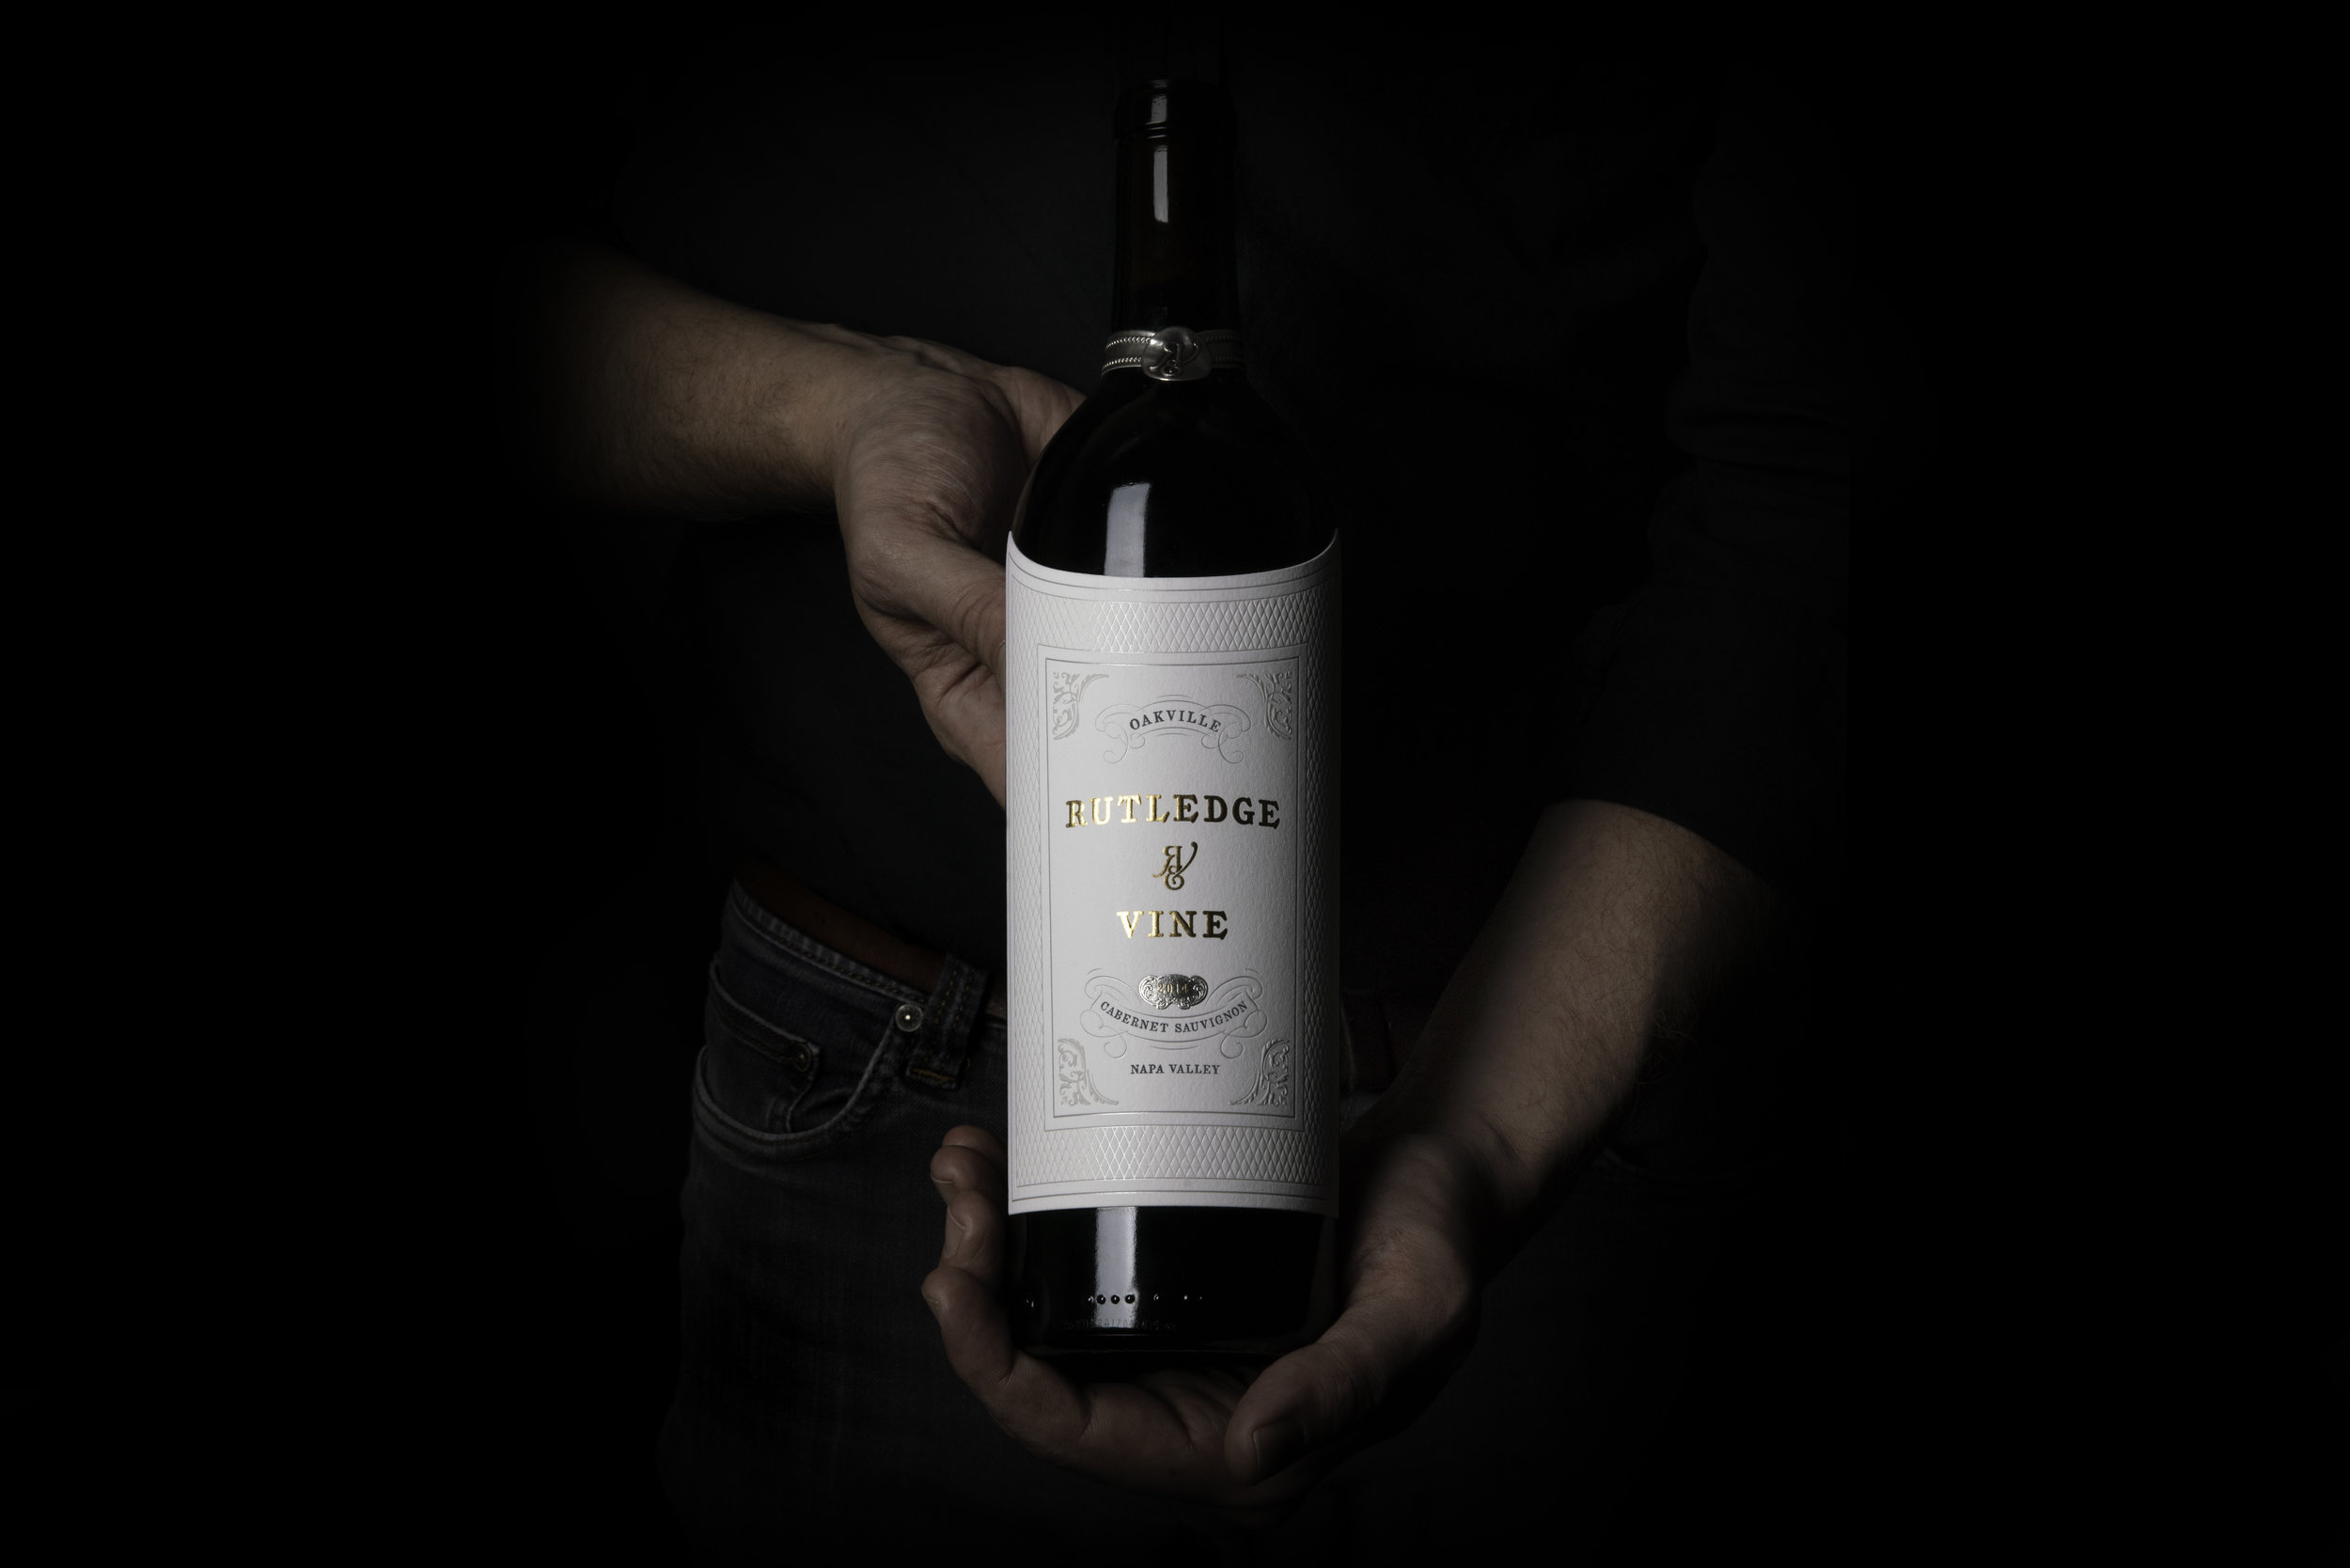 bohan | Rutledge & Vine bottle label detail.